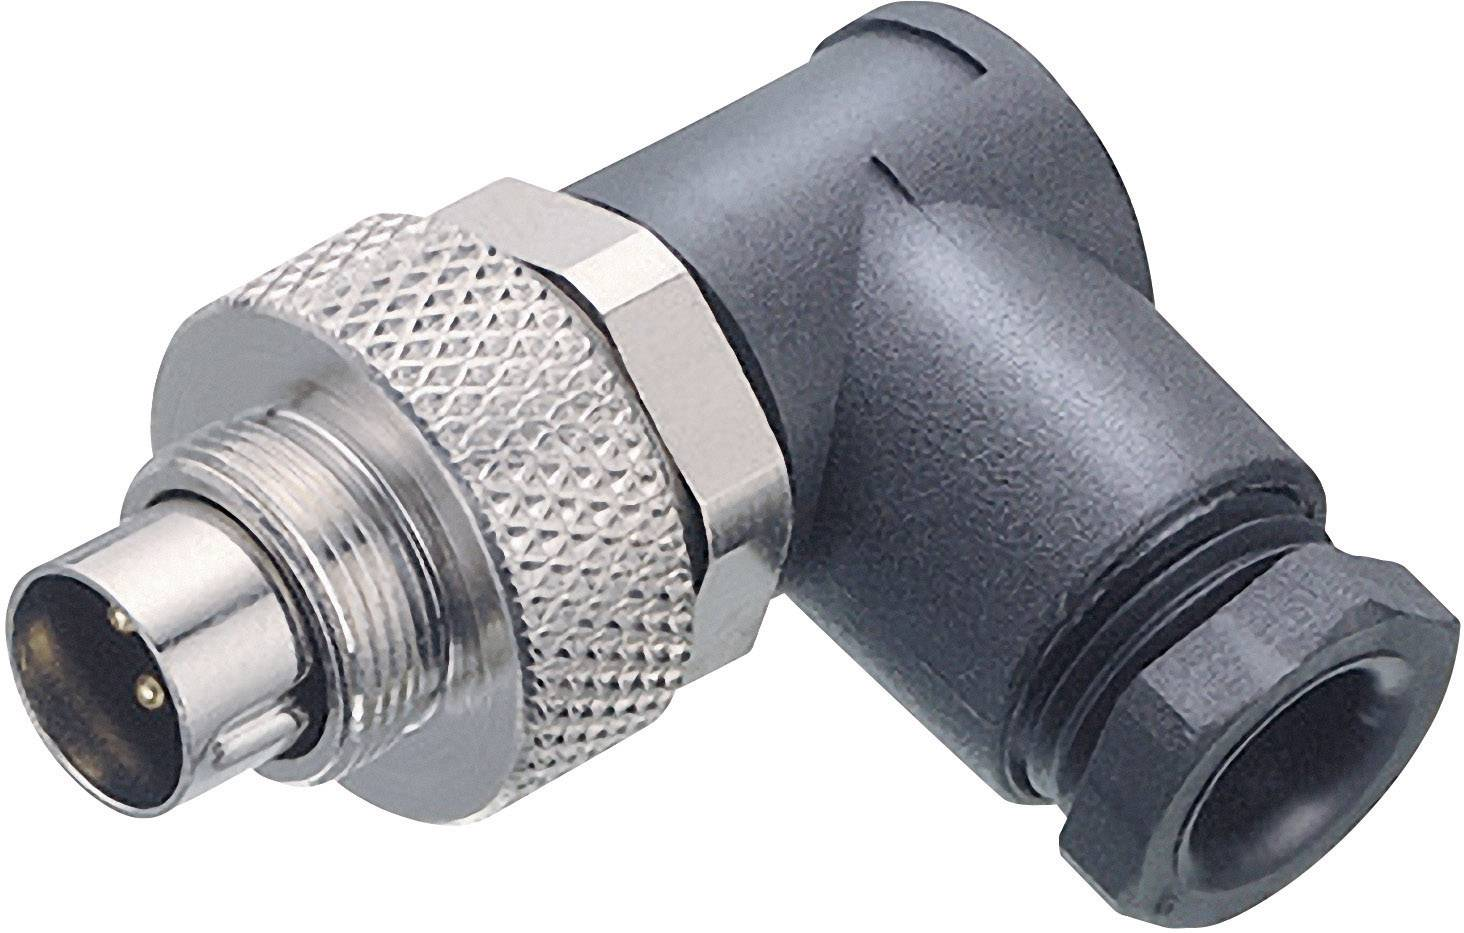 Guľatý konektor submin. Binder 99-0409-70-04, 4-pól., uhlová zástrčka, 3,5 - 5 mm, IP67